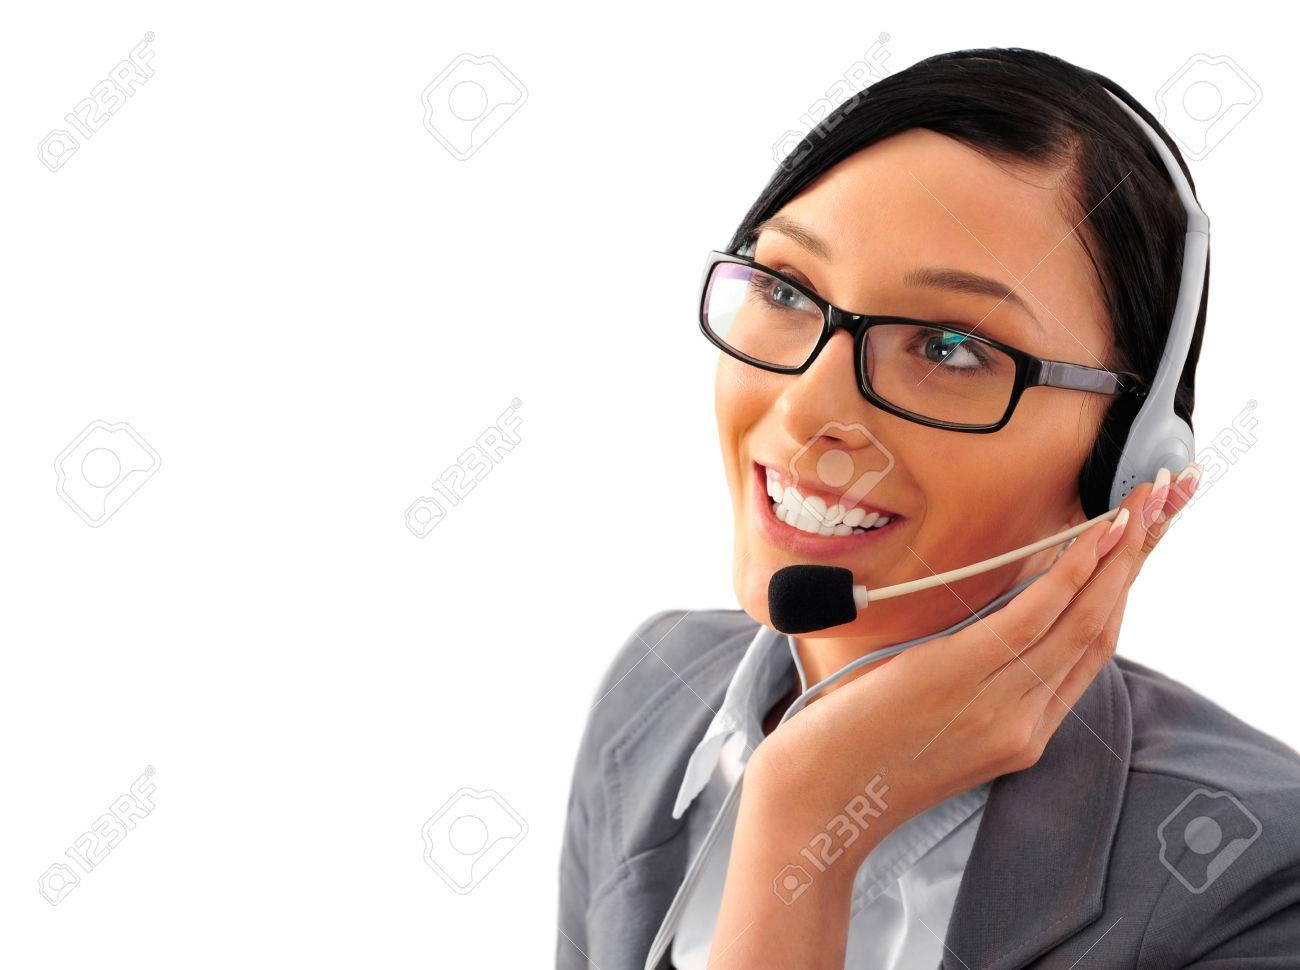 Hasil gambar untuk telemarketing